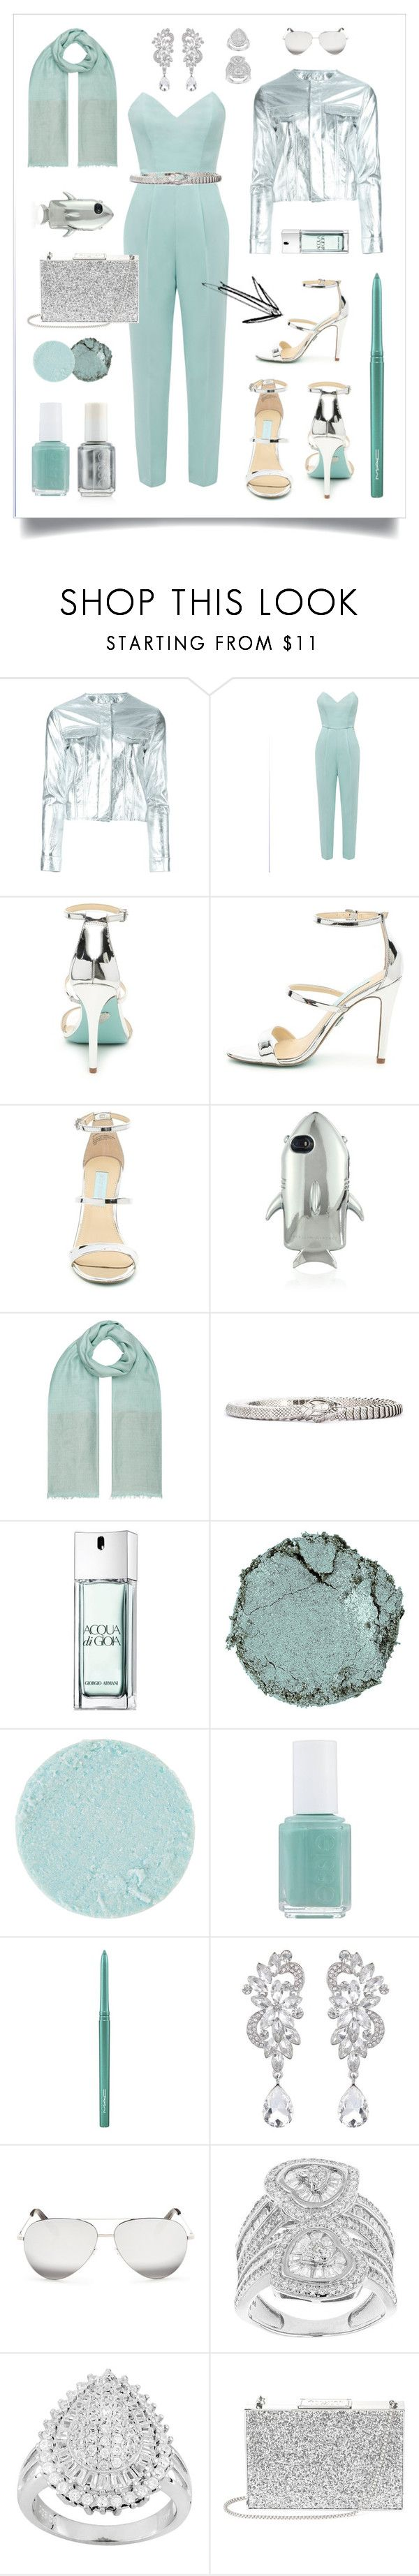 N° 72 | Featured Piece: SILVER HIGHHEELS by #yellowyippie on Polyvore featuring Mode, Marques'Almeida, STELLA McCARTNEY, Monsoon, Roberto Cavalli, Giorgio Armani, Chantecaille, Surratt, Essie und MAC Cosmetics #yellowyippie  #ootd  #getthelook  #polyvore  #fashion #featuredpiece #chic #mint #aqua #silver #partydress #datenight  #blinddate